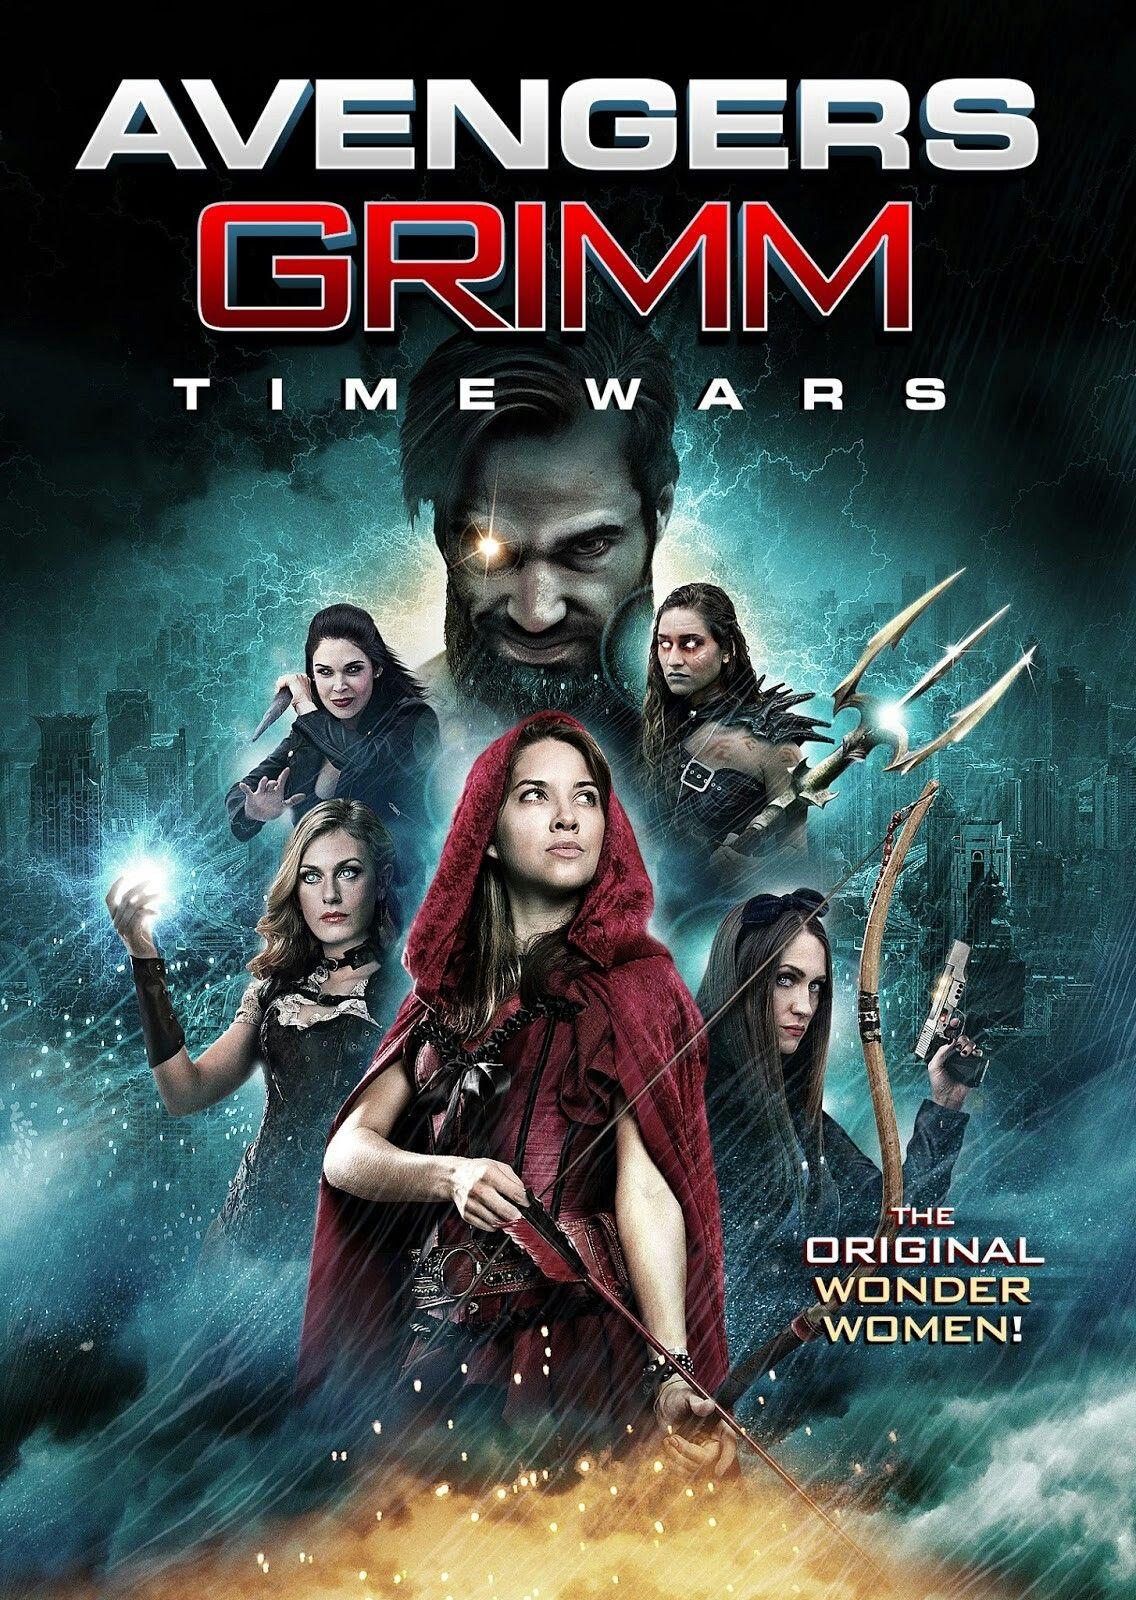 Nonton Film Avengers Grimm Time Wars 2018 Full Hd Subtitle